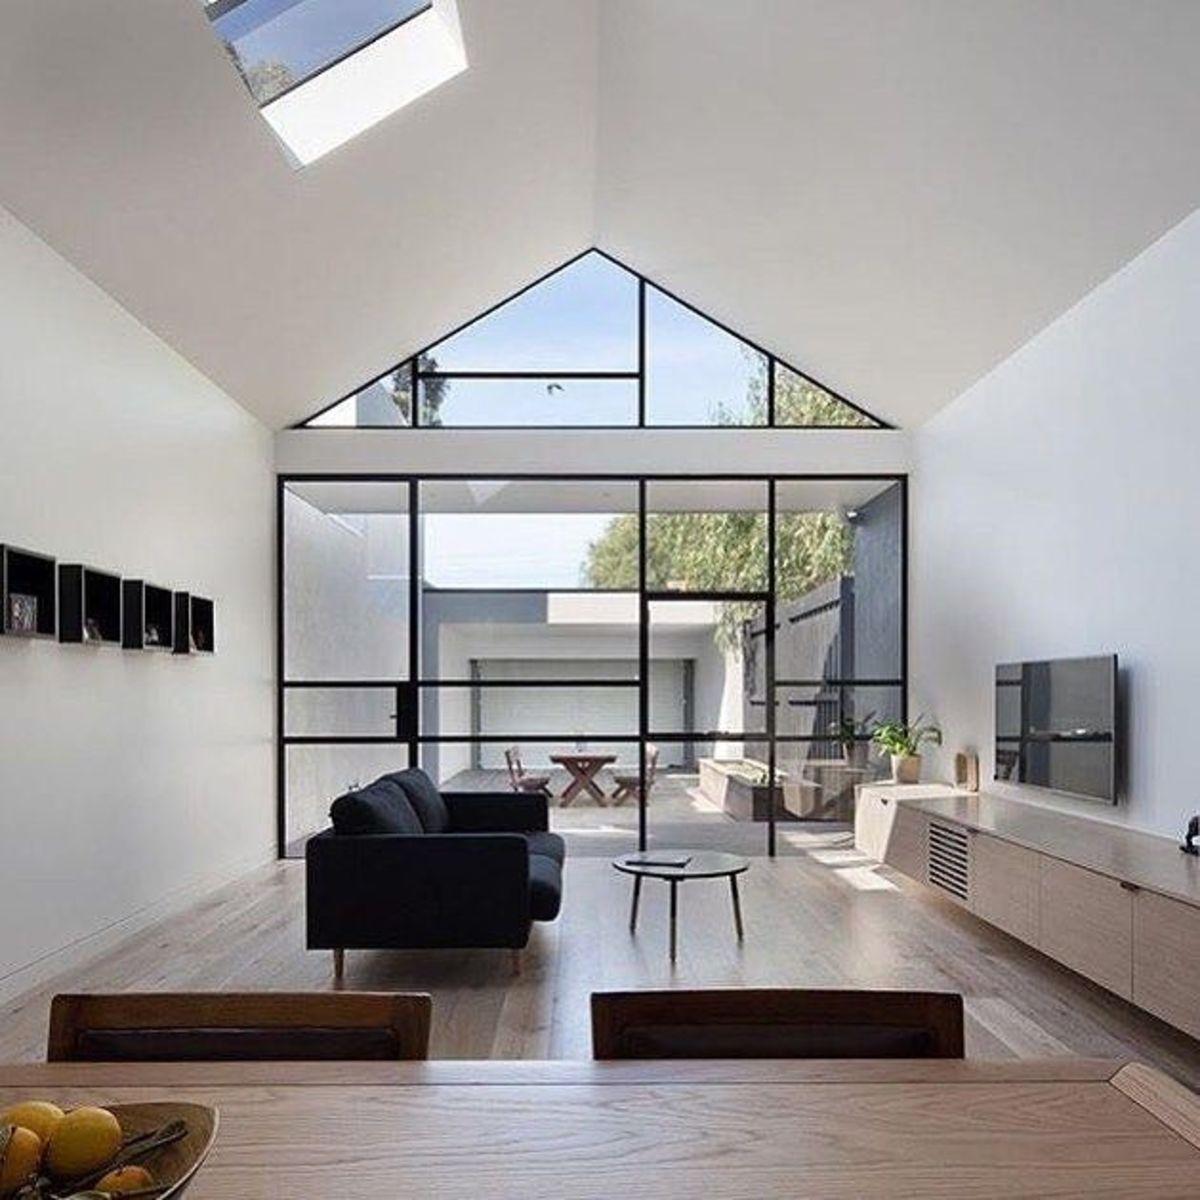 Minimal Interior Design Inspiration 51   Minimalism interior, Minimal interior design, Interior ...